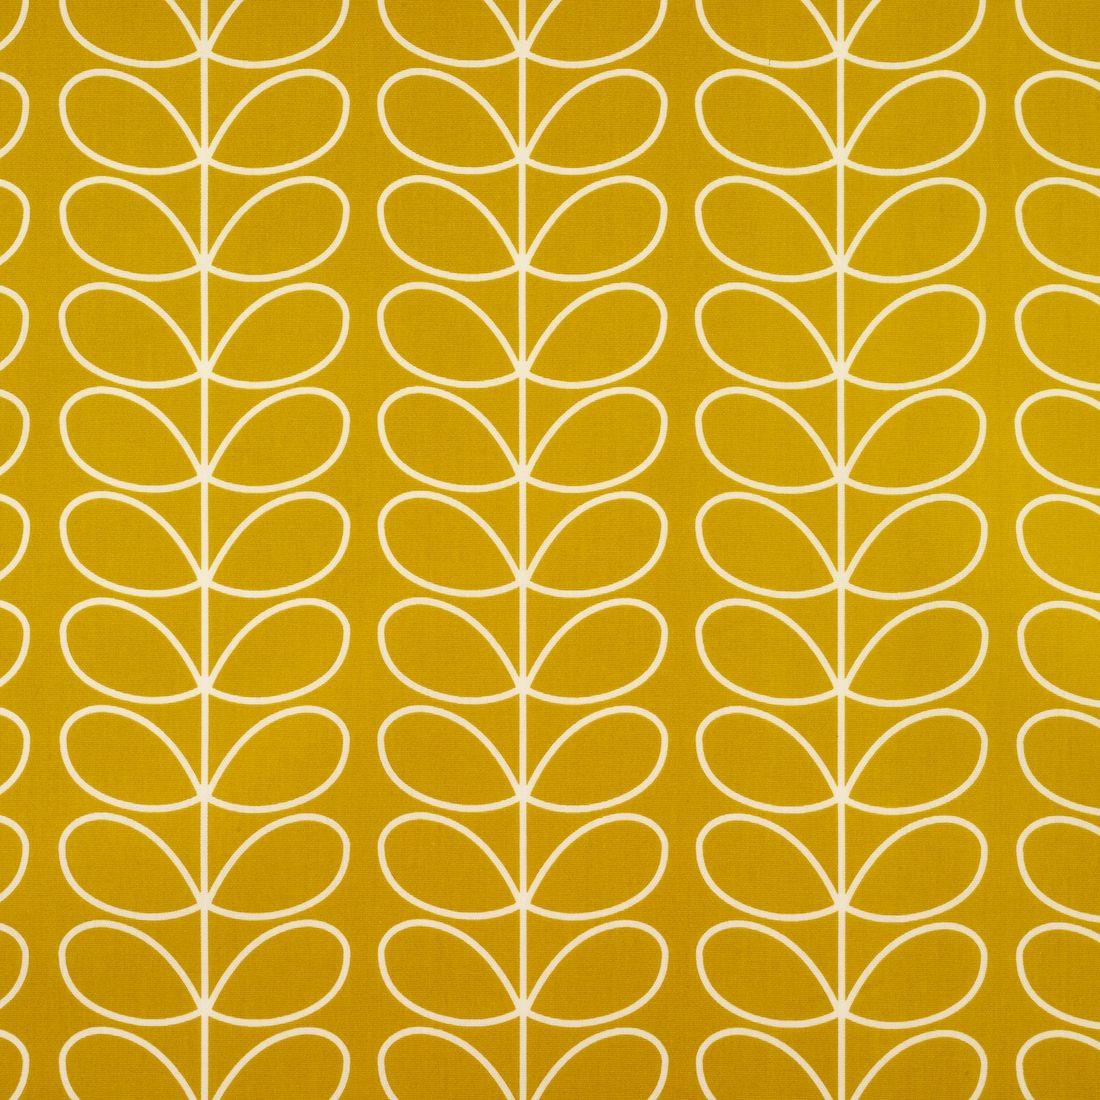 Orla Kiely Linear Stem Dandelion Mustard Yellow Oilcloth #mustardyellow